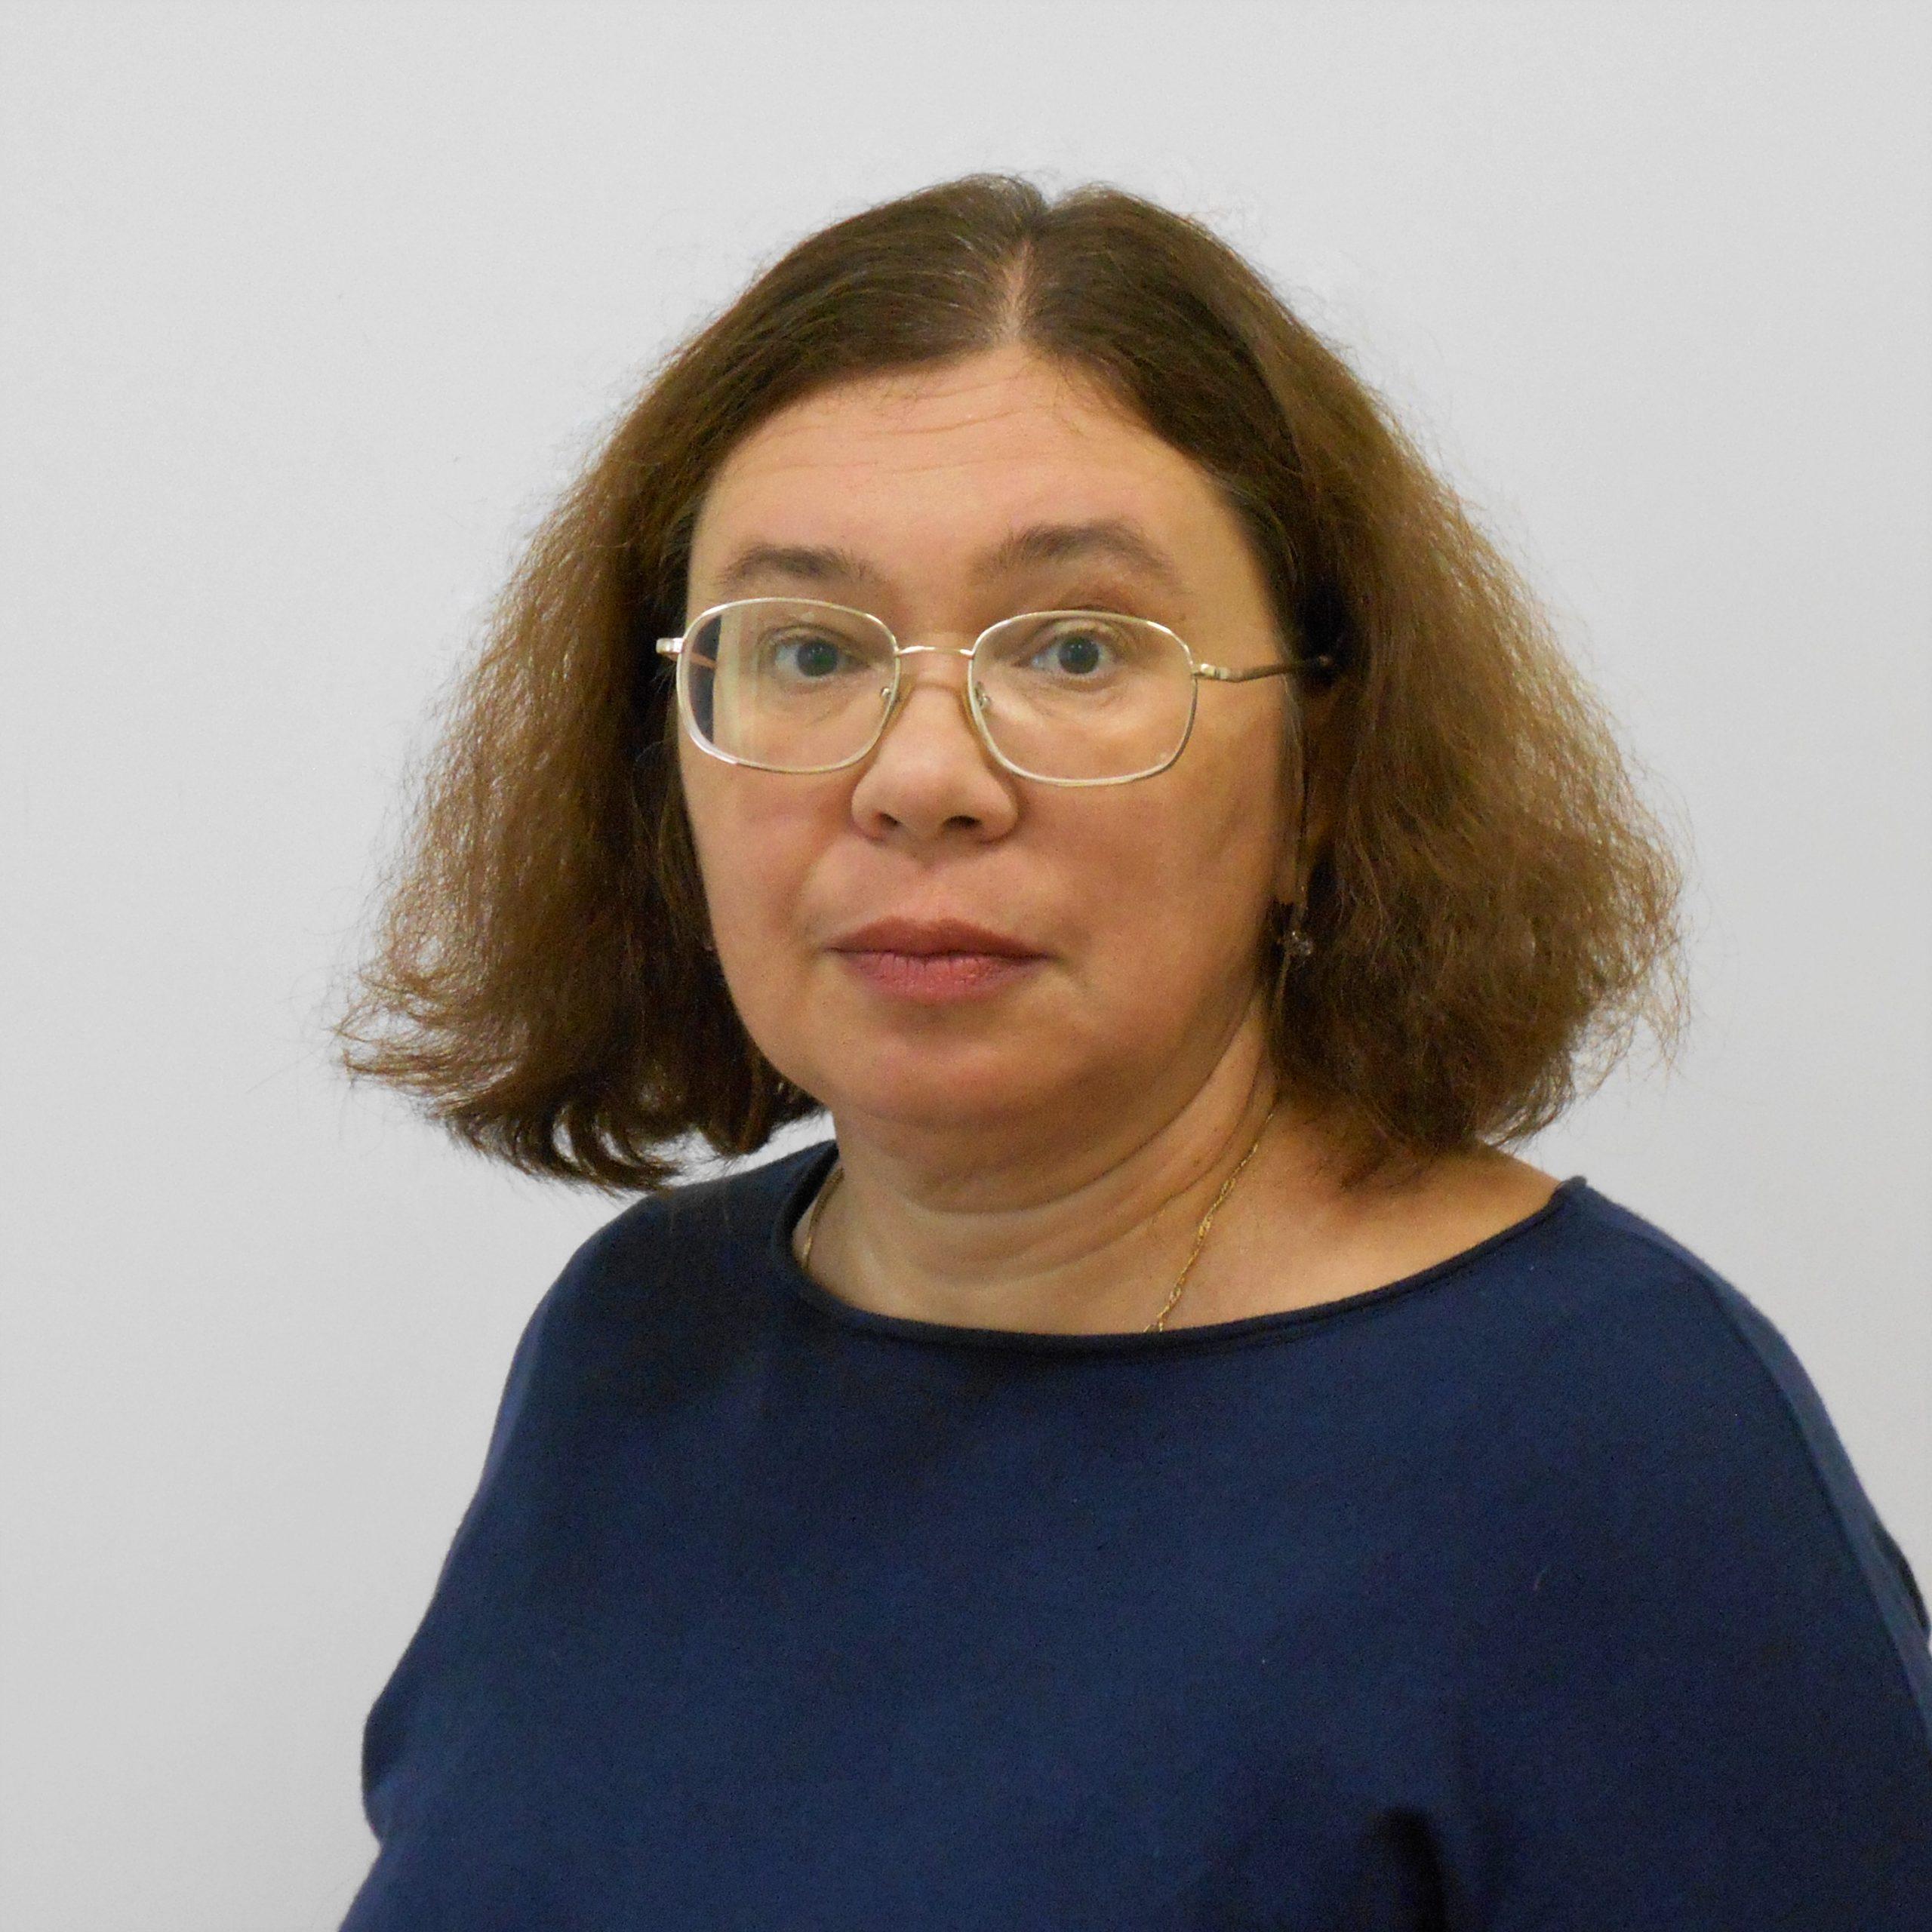 Anna Lavrentieva